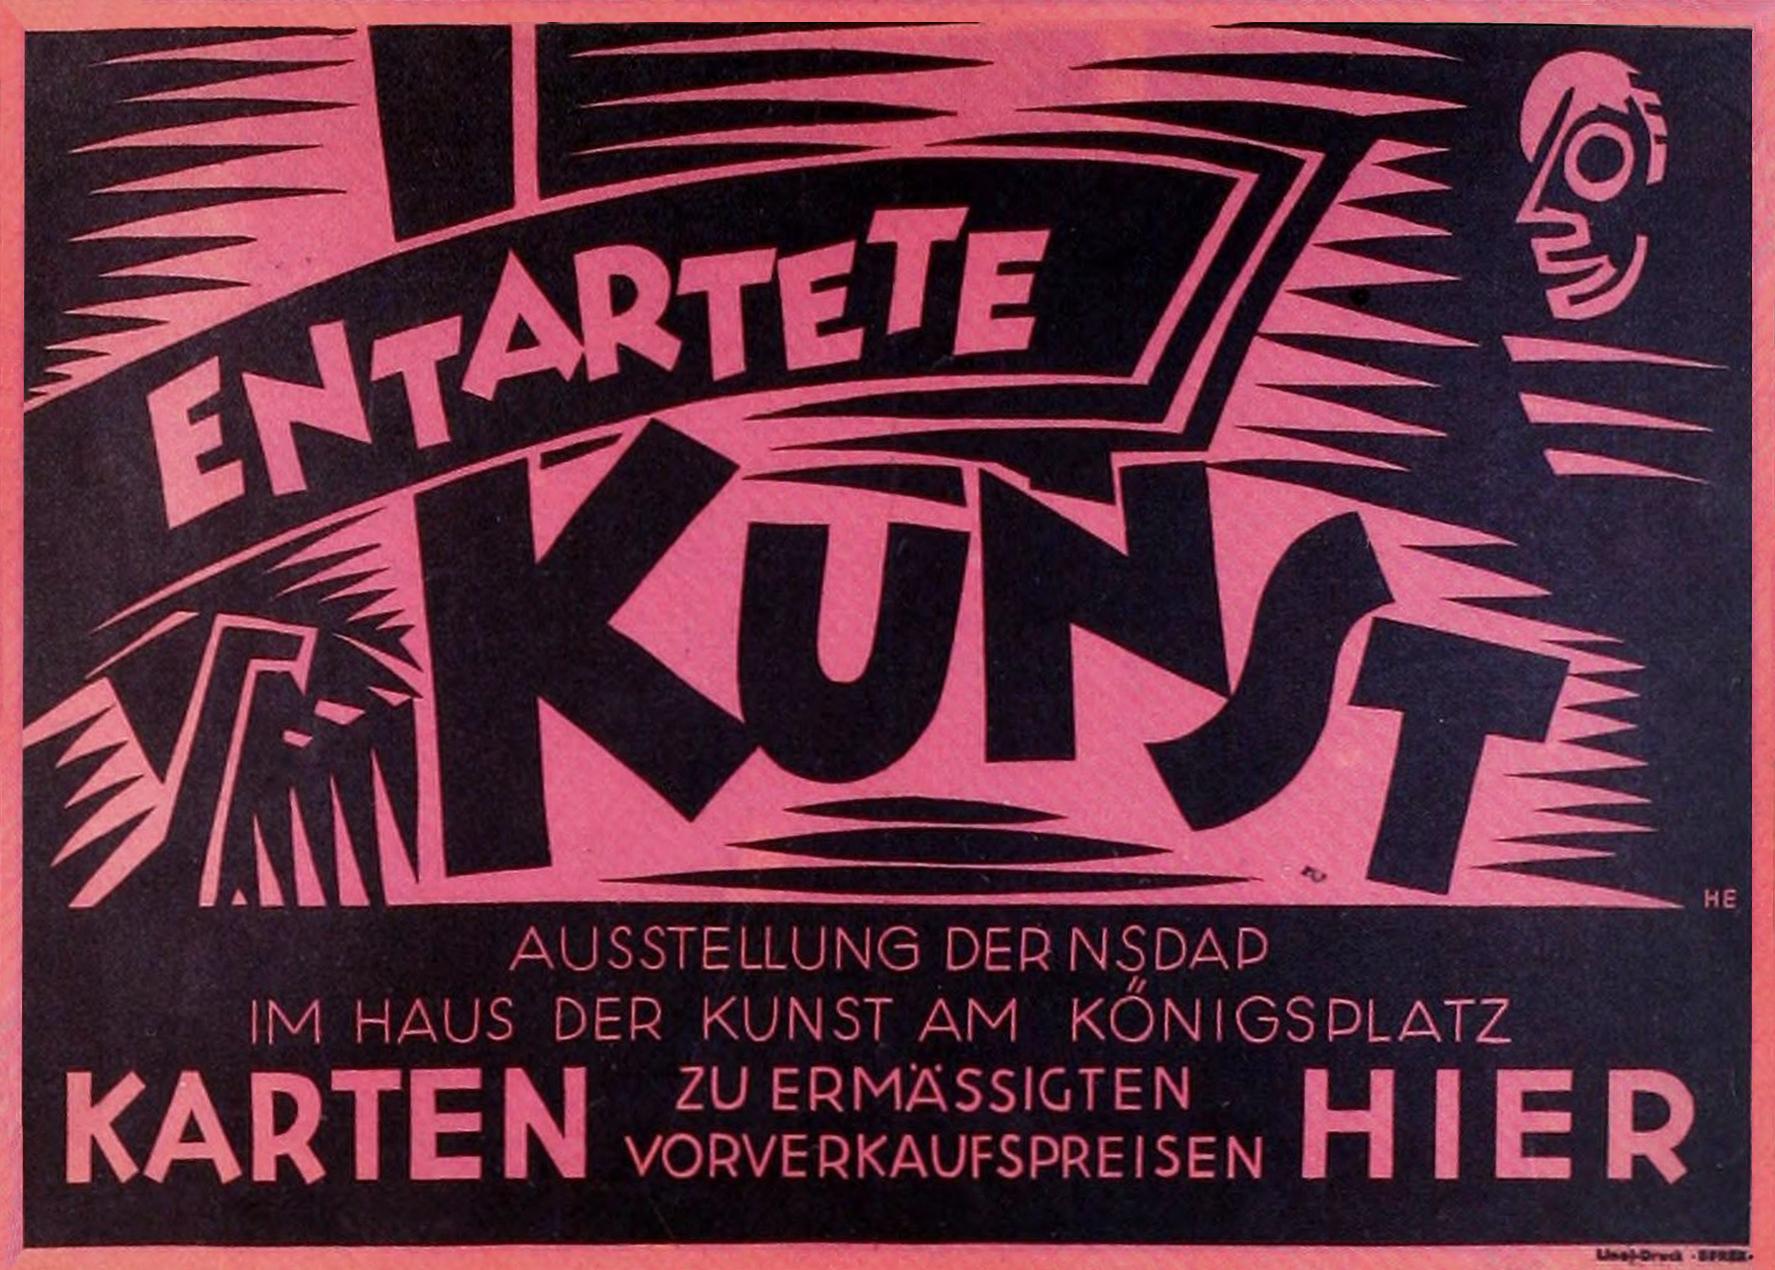 Entartete Kunst Exhibit Poster, 1938